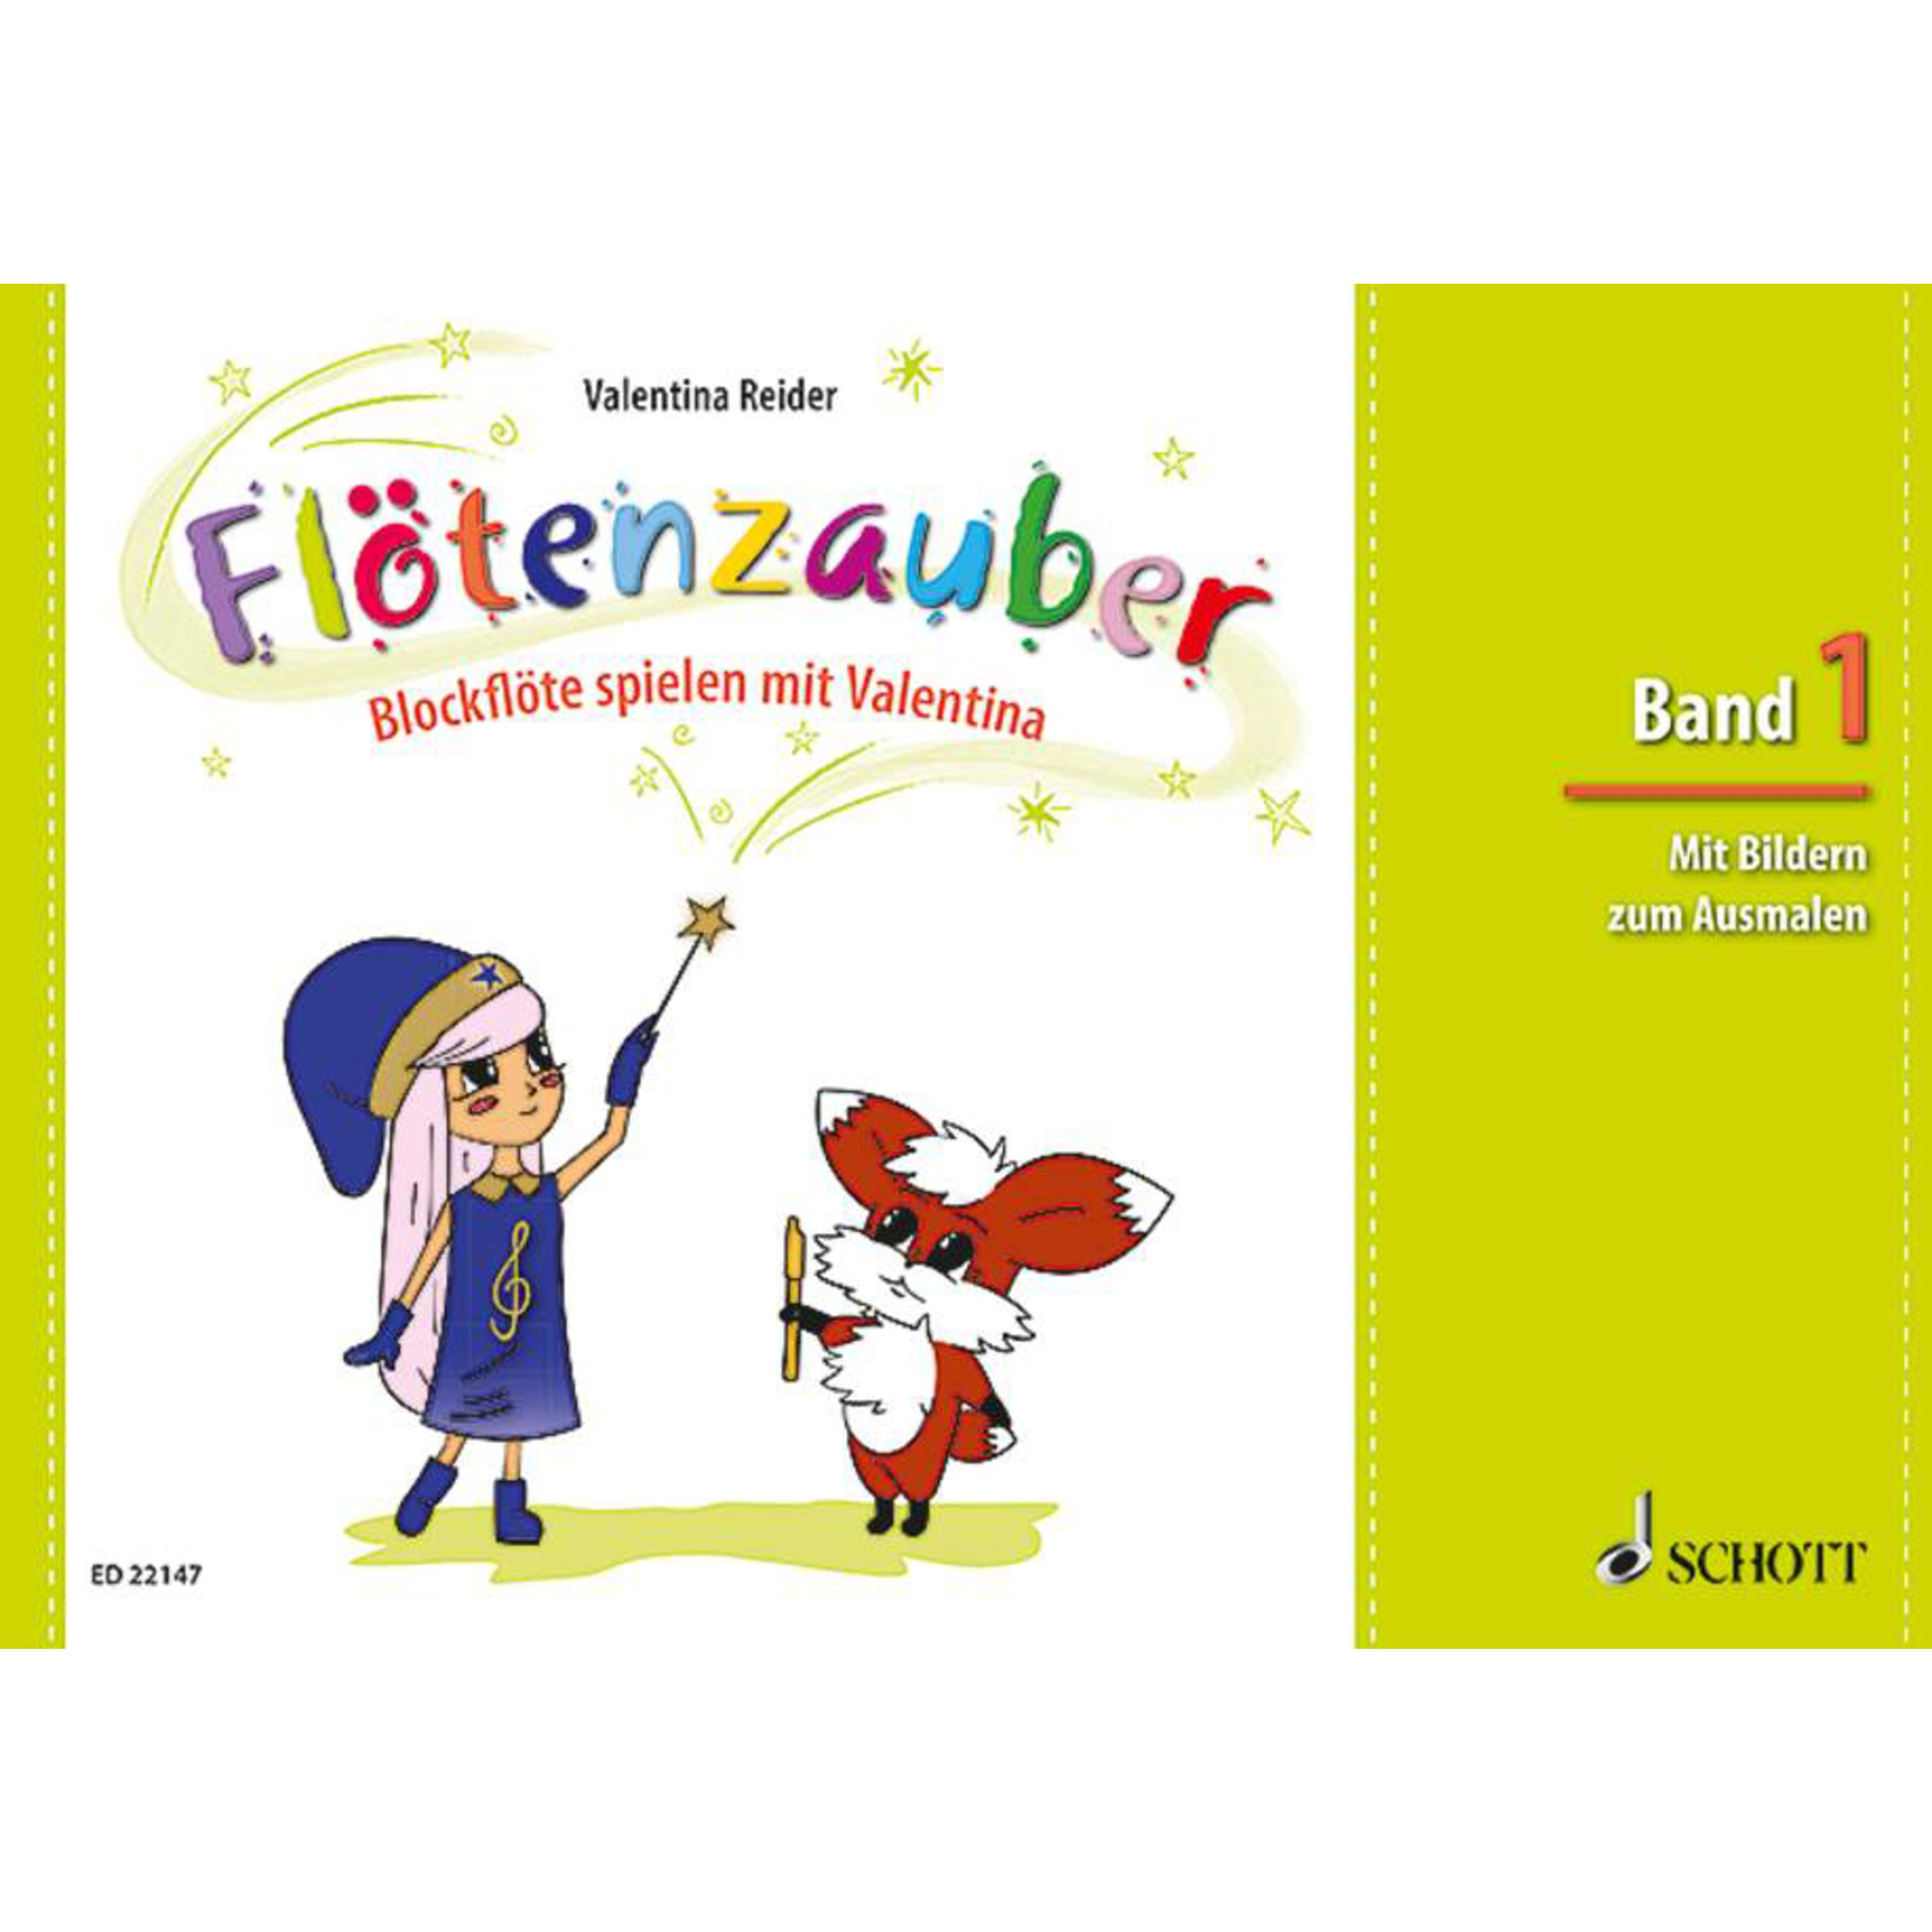 Schott Music - Flötenzauber 1 ED 22147